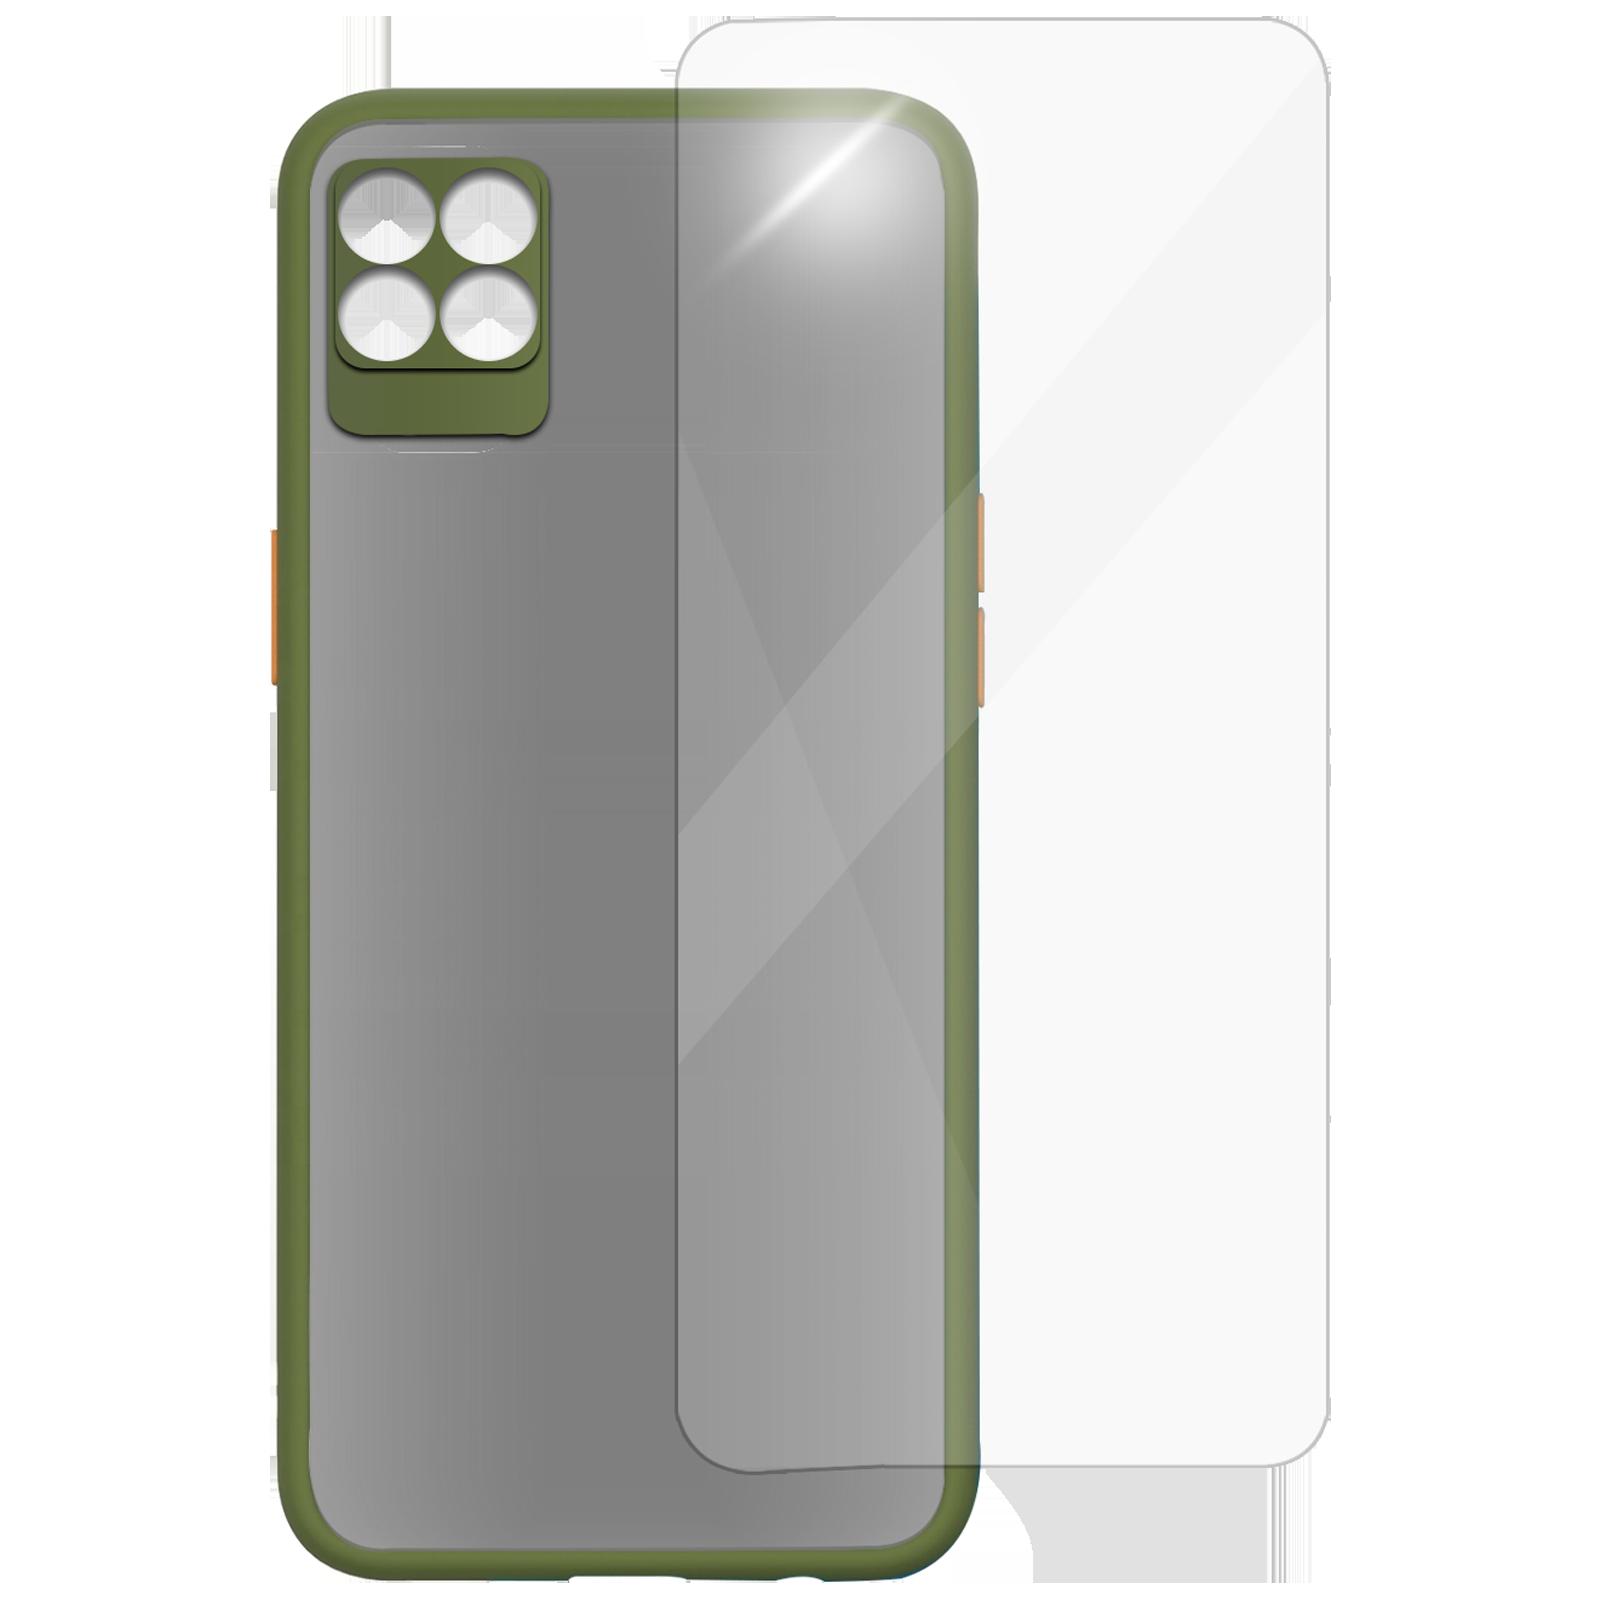 Arrow Camera Duplex Back Case and Screen Protector Bundle For Realme 8 Pro (Ultra Transparent Visibility, AR-1047, Light Green)_1